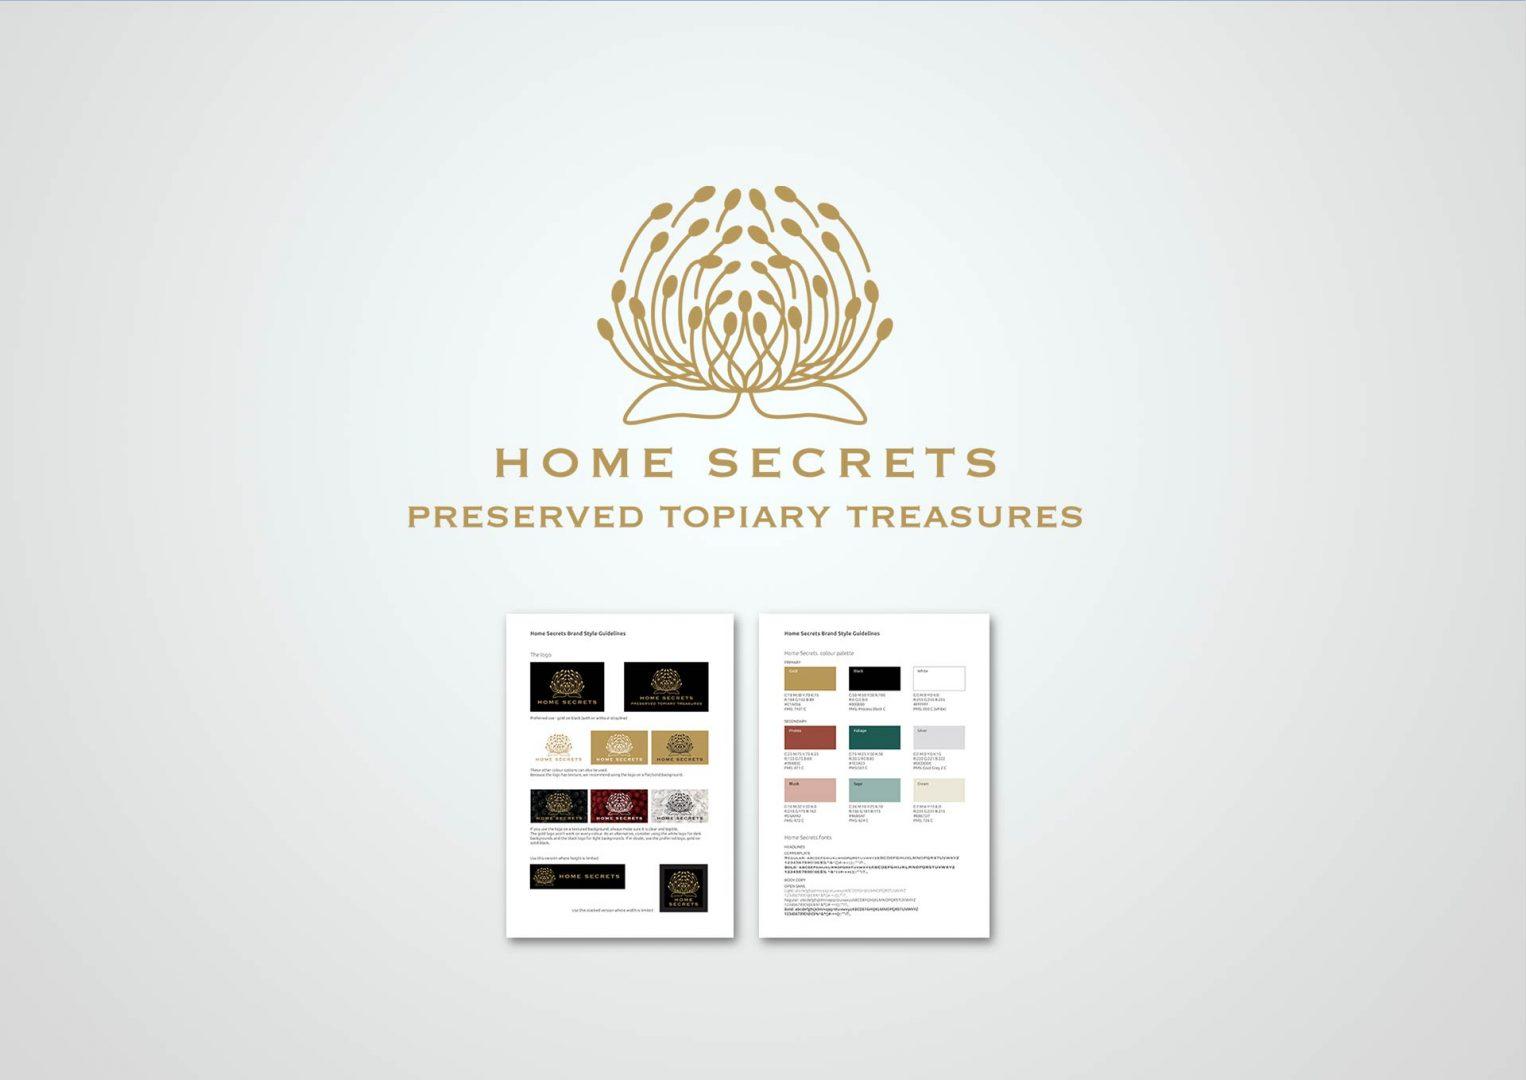 Home Secrets, Logo design, Graphic Designer, Photoshop, Branding, Romford, Essex, Jan Lewis Creative